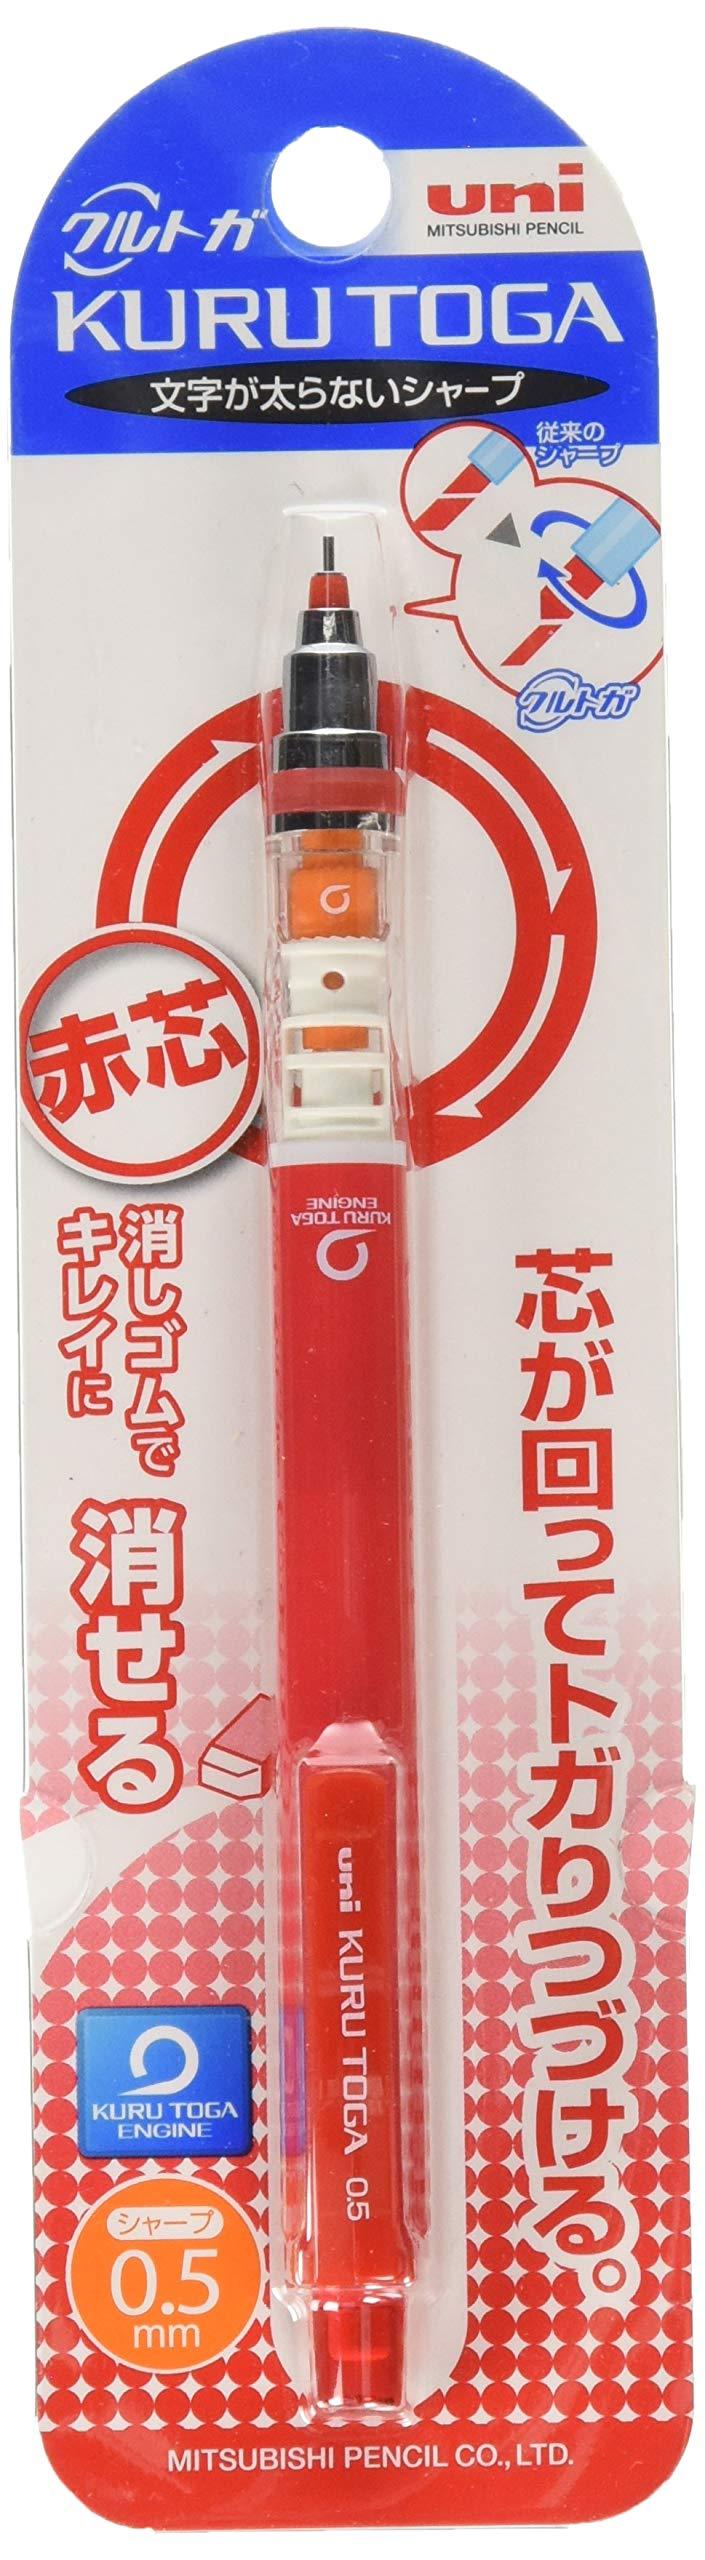 Mitsubishi Kuru Toga 0.5mm Sharp Roulette Model M54501P.33 Blue from Japan